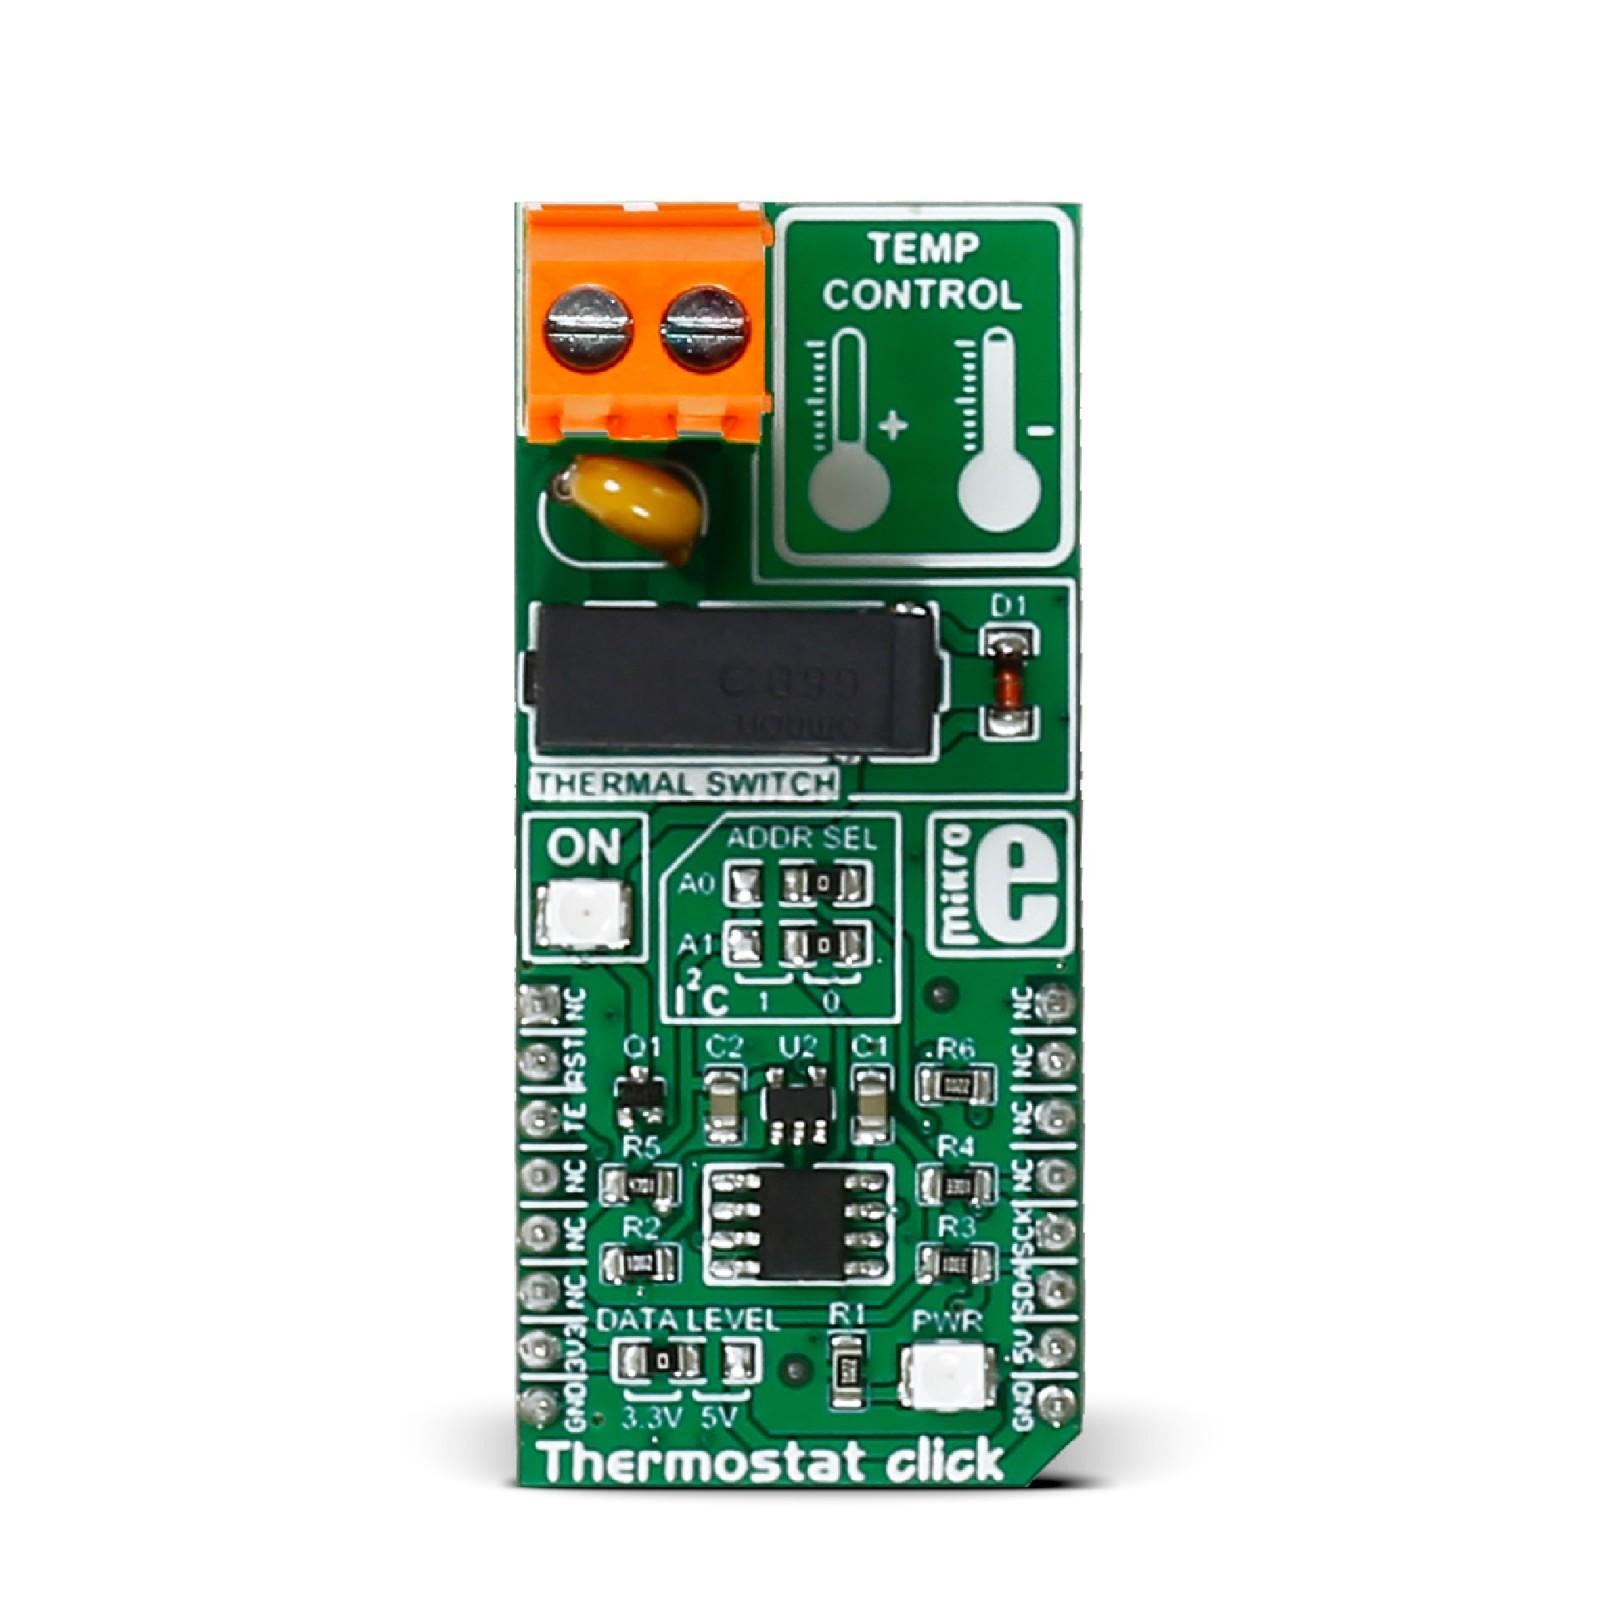 Thermostat Click Digital Circuit Board Wiring Diagram Mgctlbxnmzp Mgctlbxv5112 Mgctlbxlc Mgctlbxpprestashop